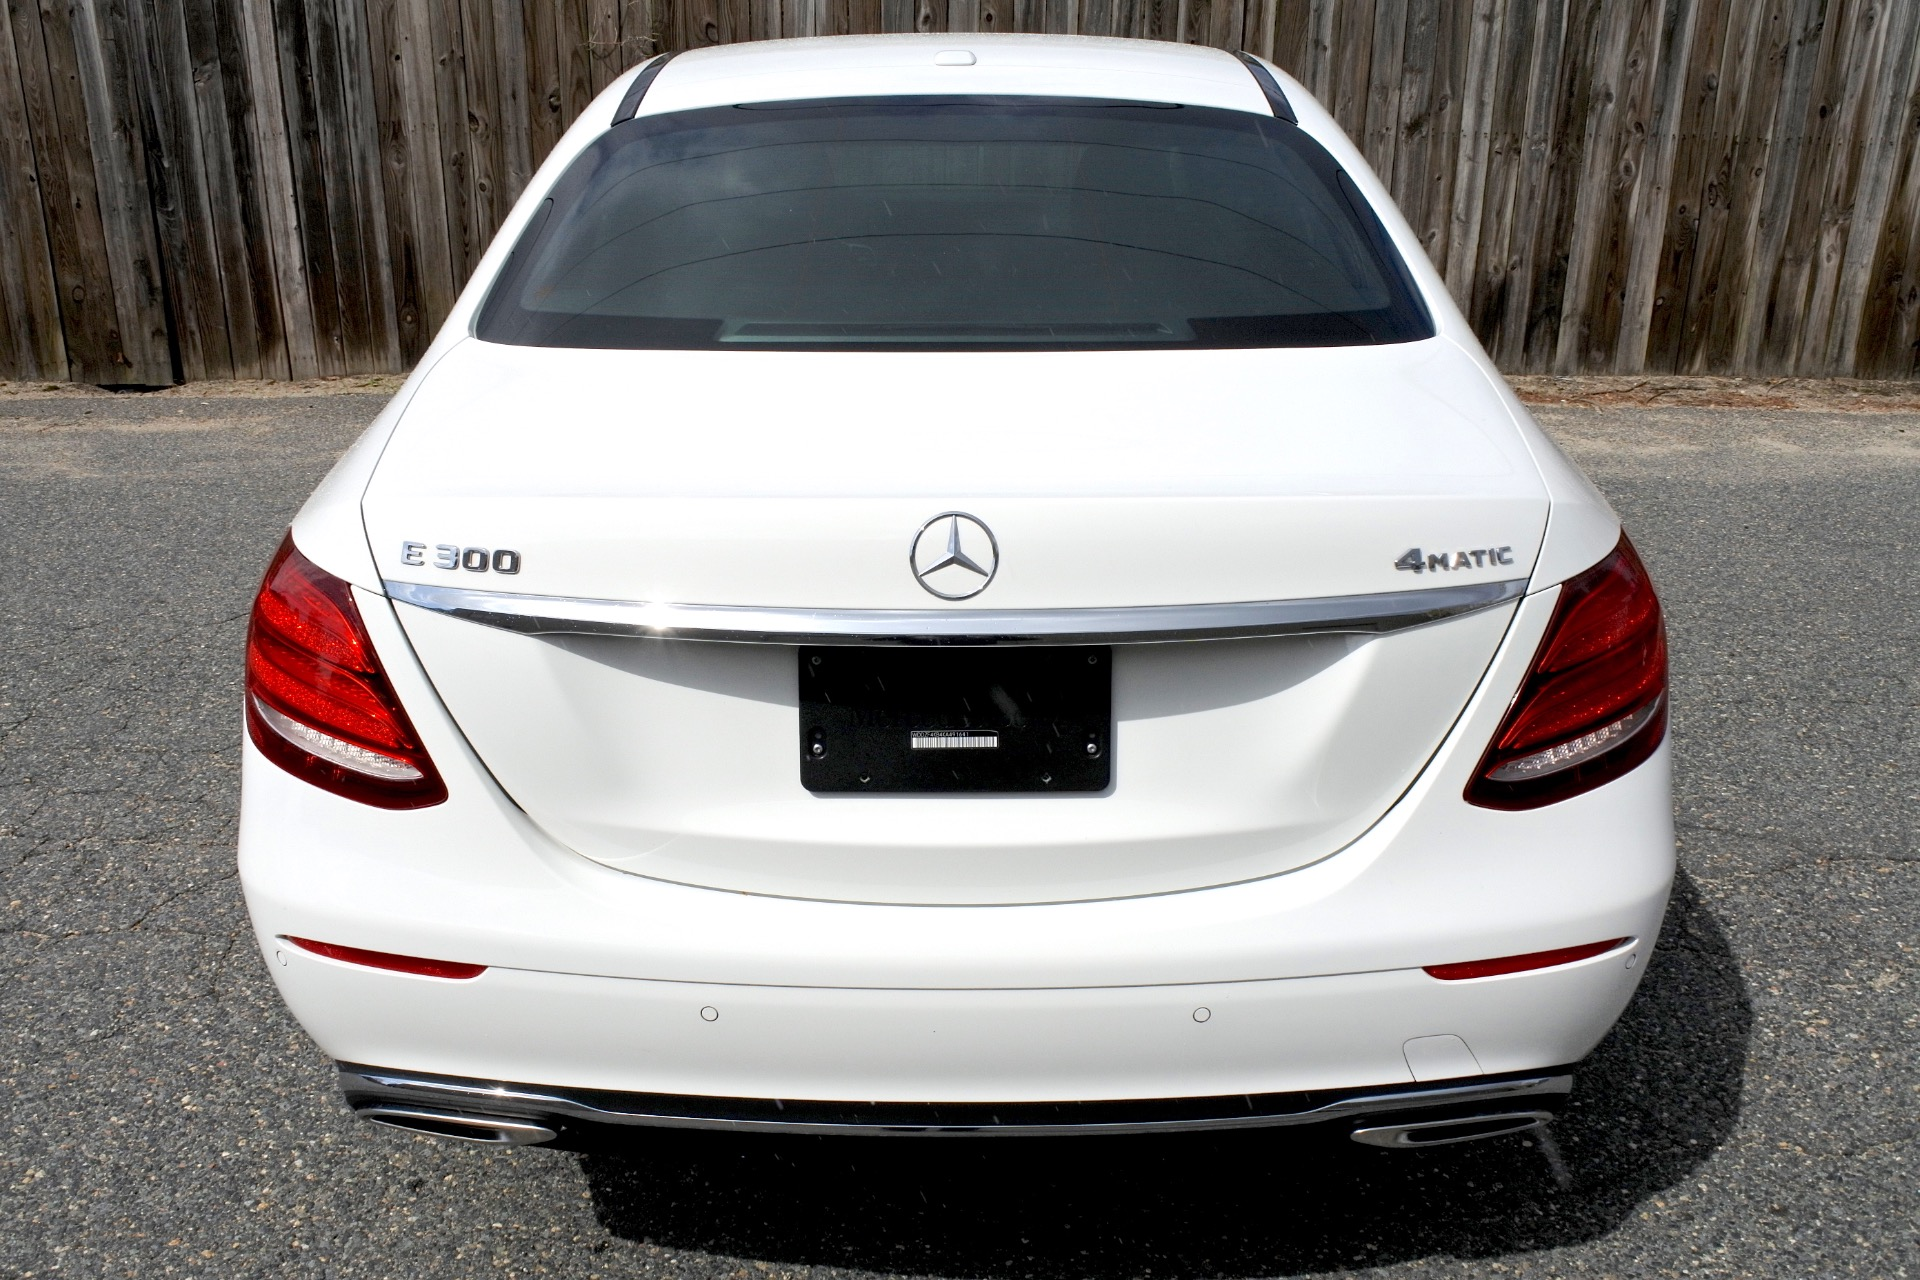 Used 2019 Mercedes-Benz E-class E 300 4MATIC Used 2019 Mercedes-Benz E-class E 300 4MATIC for sale  at Metro West Motorcars LLC in Shrewsbury MA 4